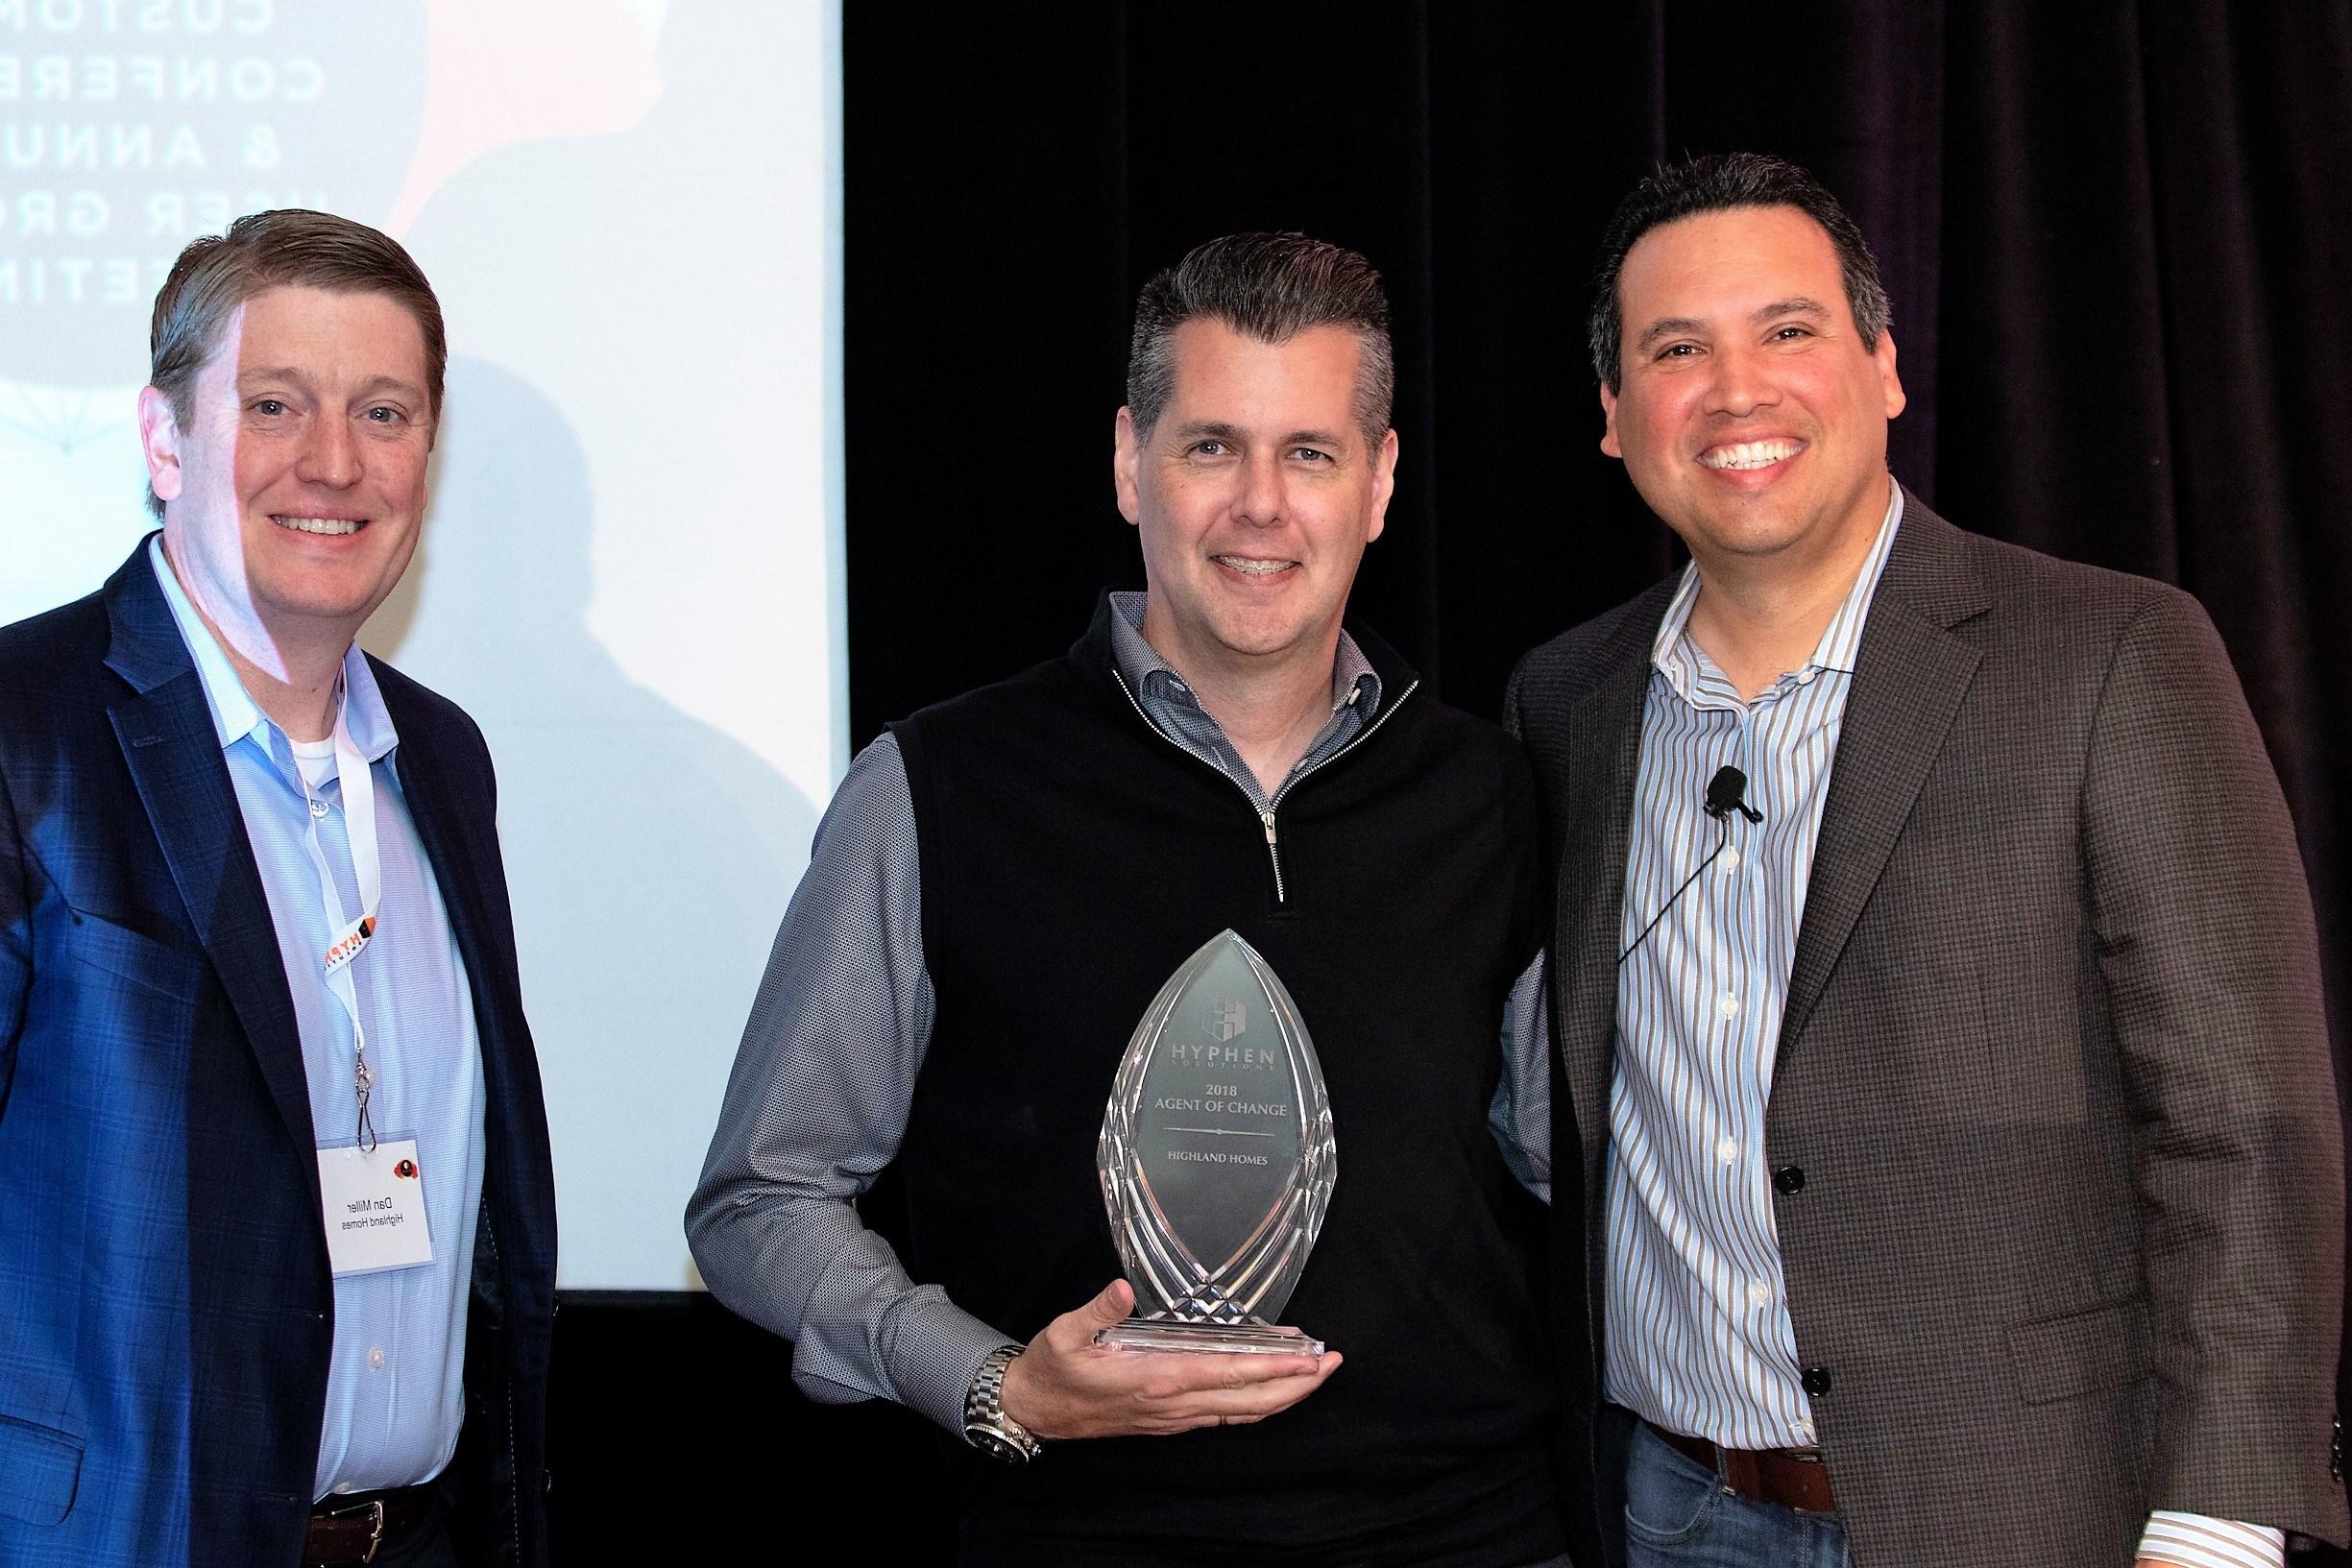 Shown: Hyphen Solutions, CEO, Dr. Felix Vasquez. Highland Homes: CIO, Jeff Dinard, and CFO, Dan Miller.